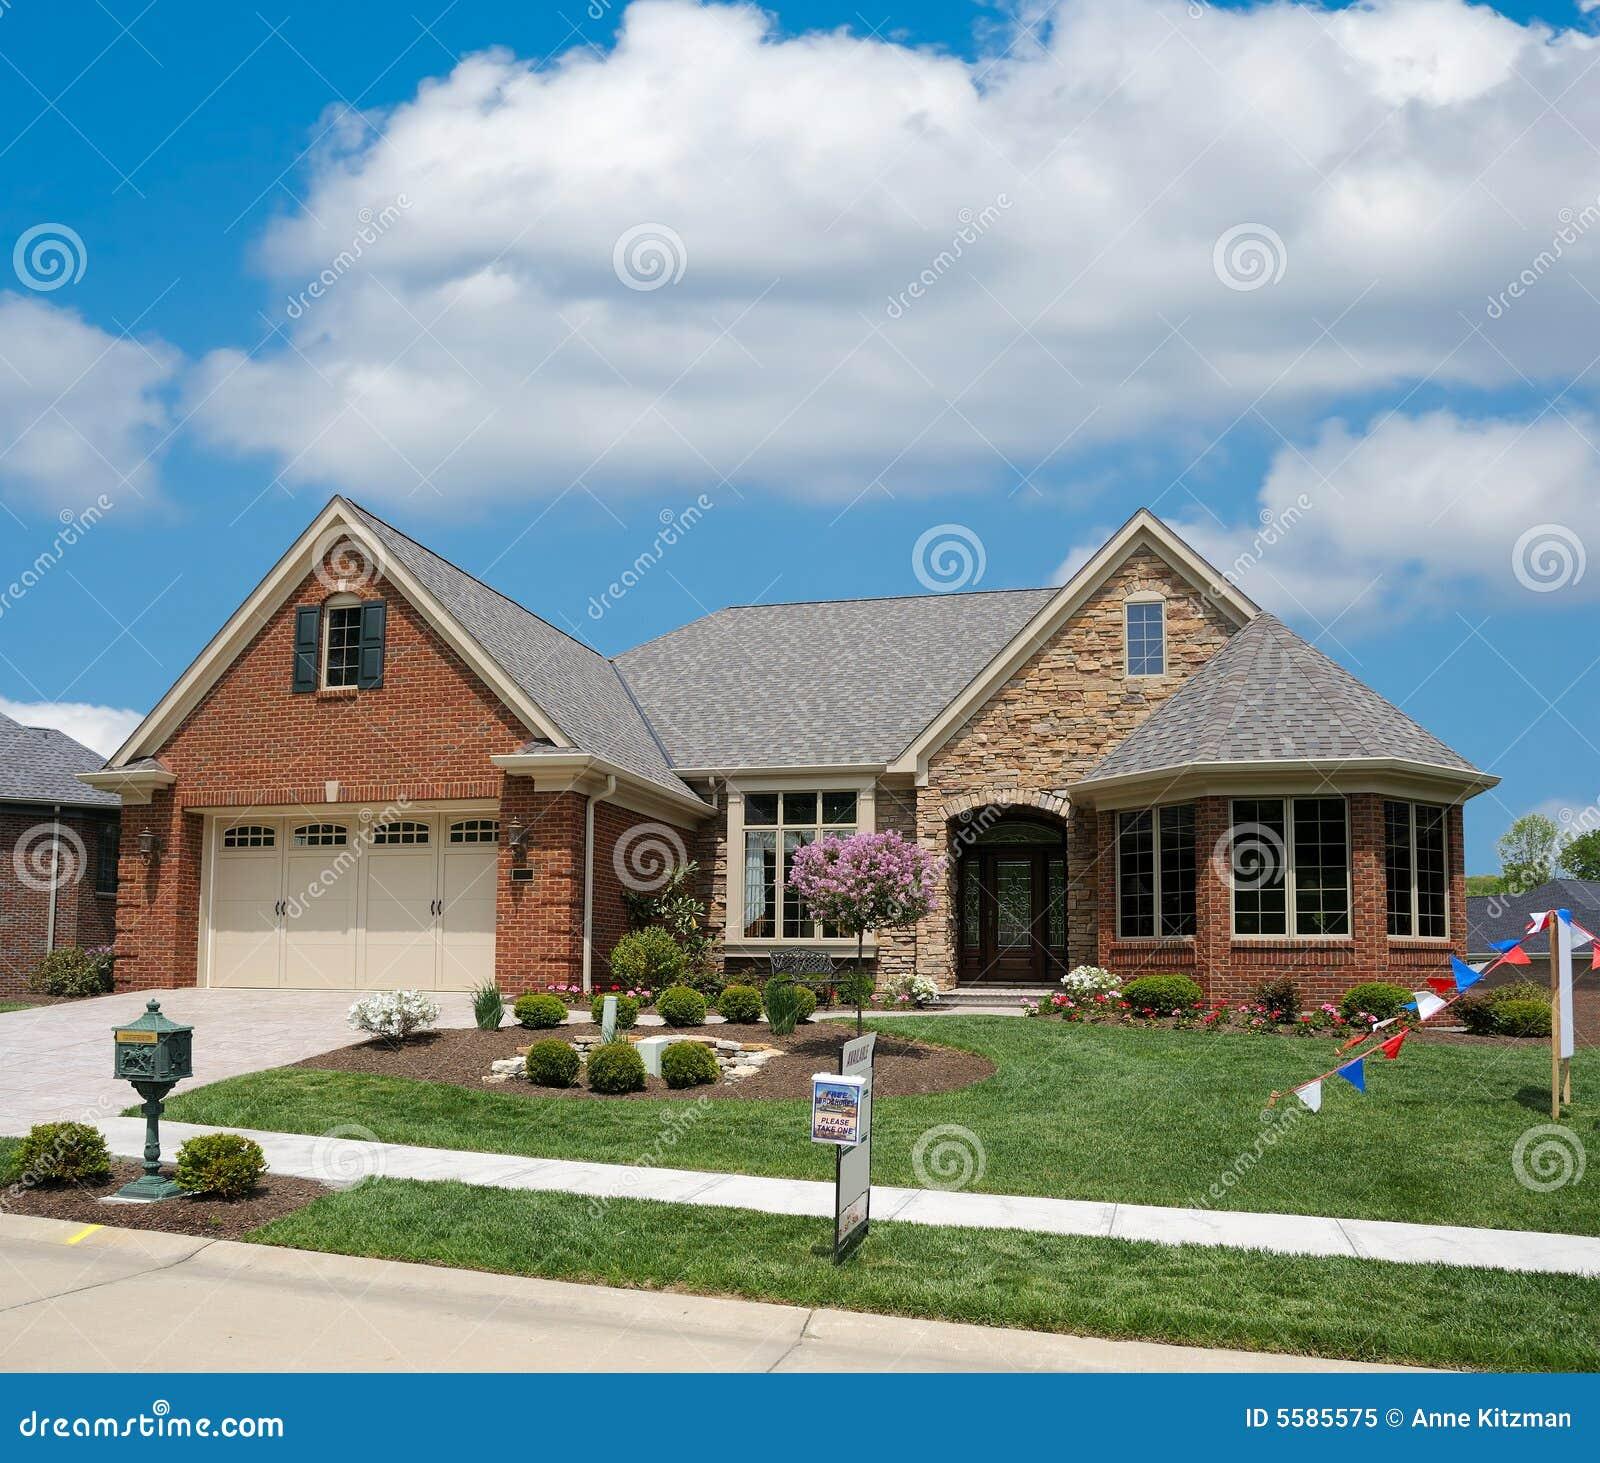 Brick Suburban Home Stock Image. Image Of Lawn, Yard